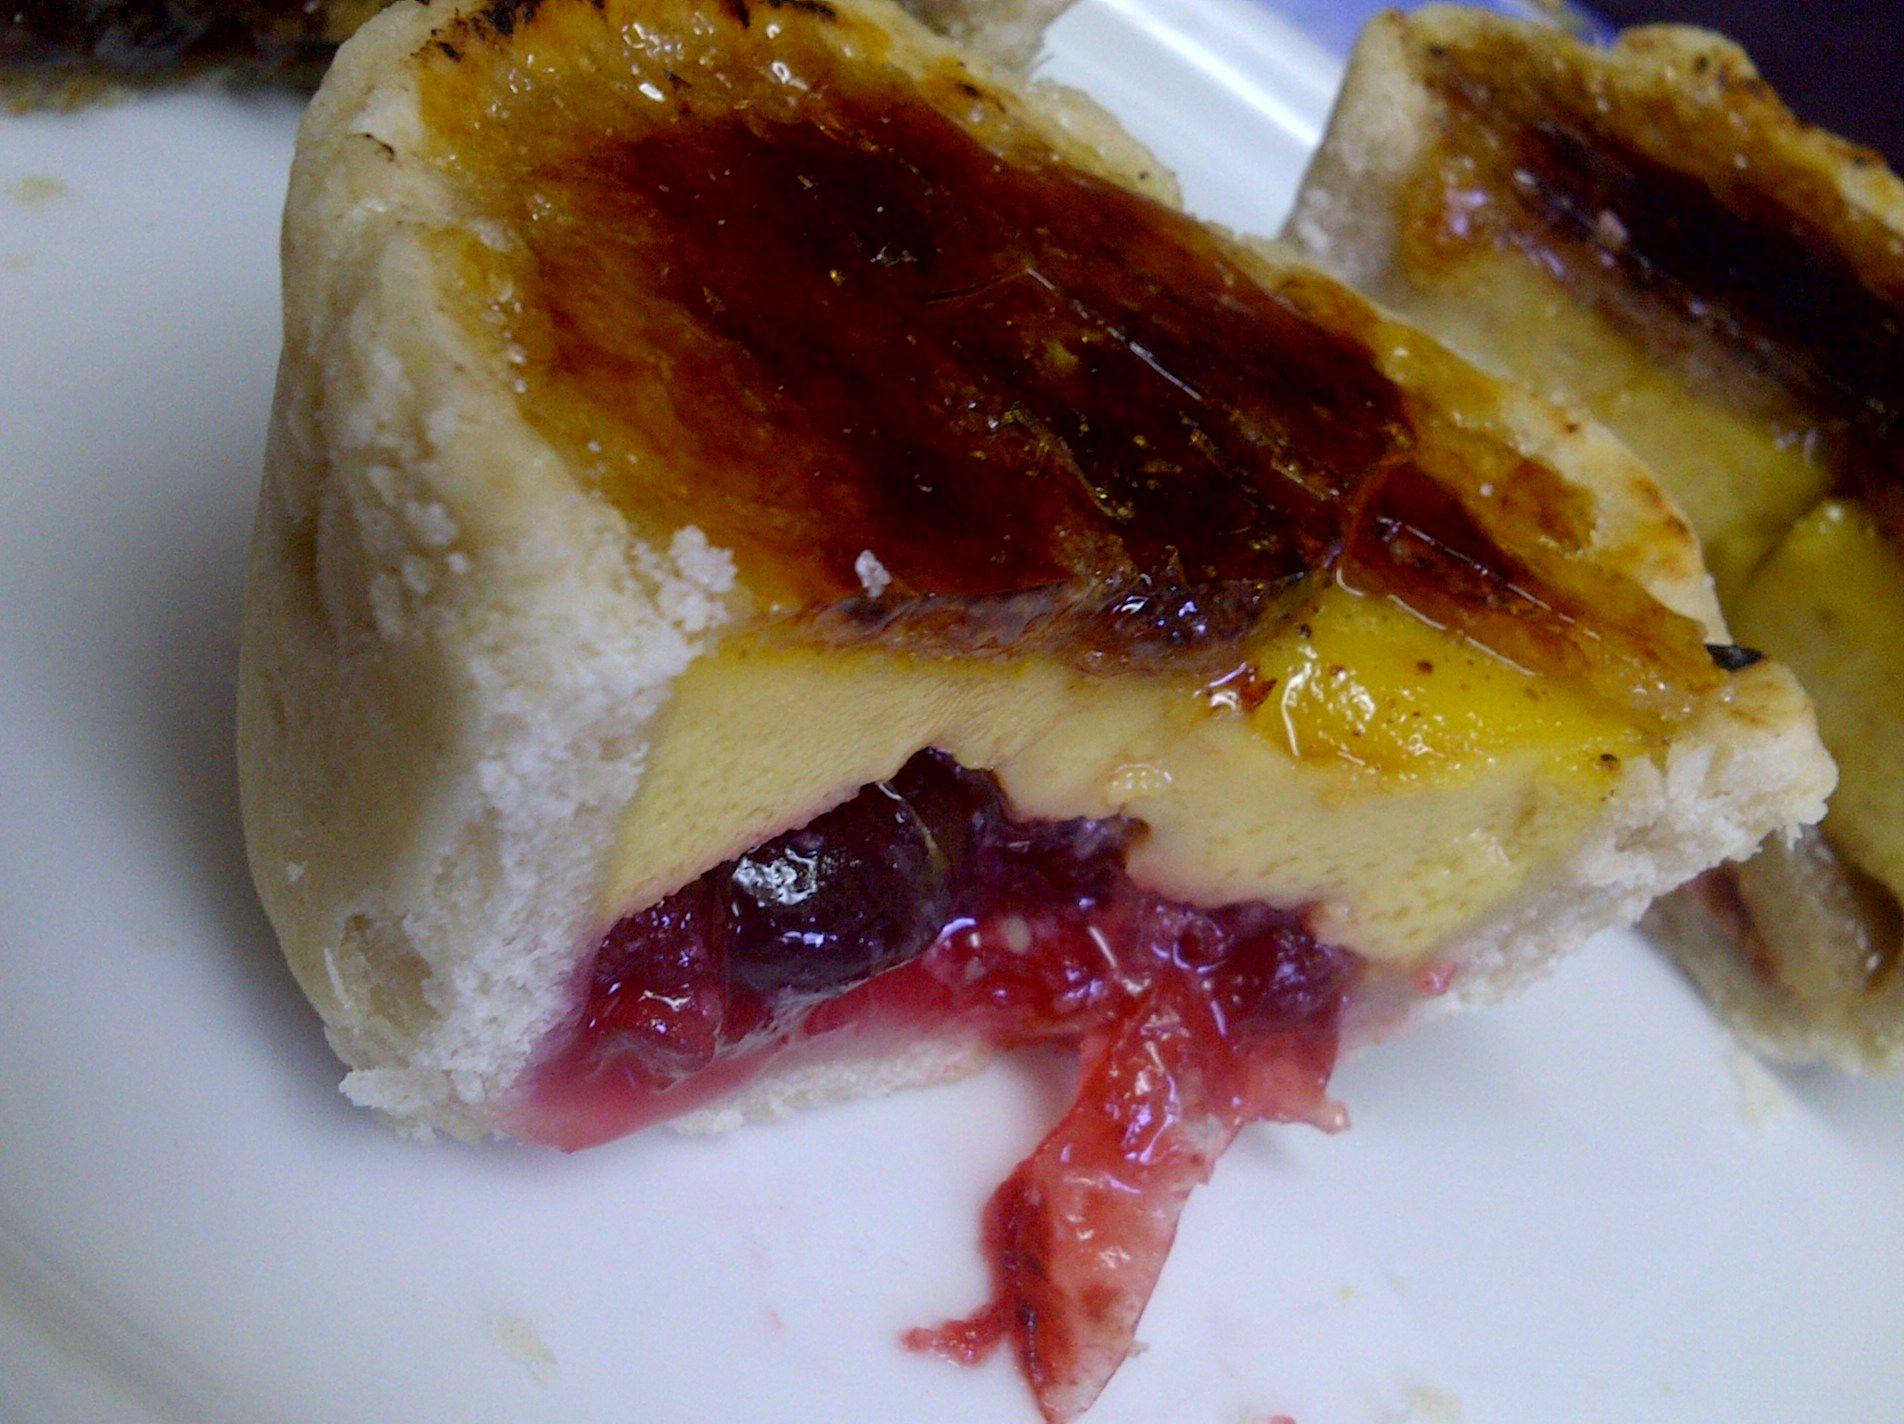 Cranberry w/Citrus-infused Custard (brûléed tart)